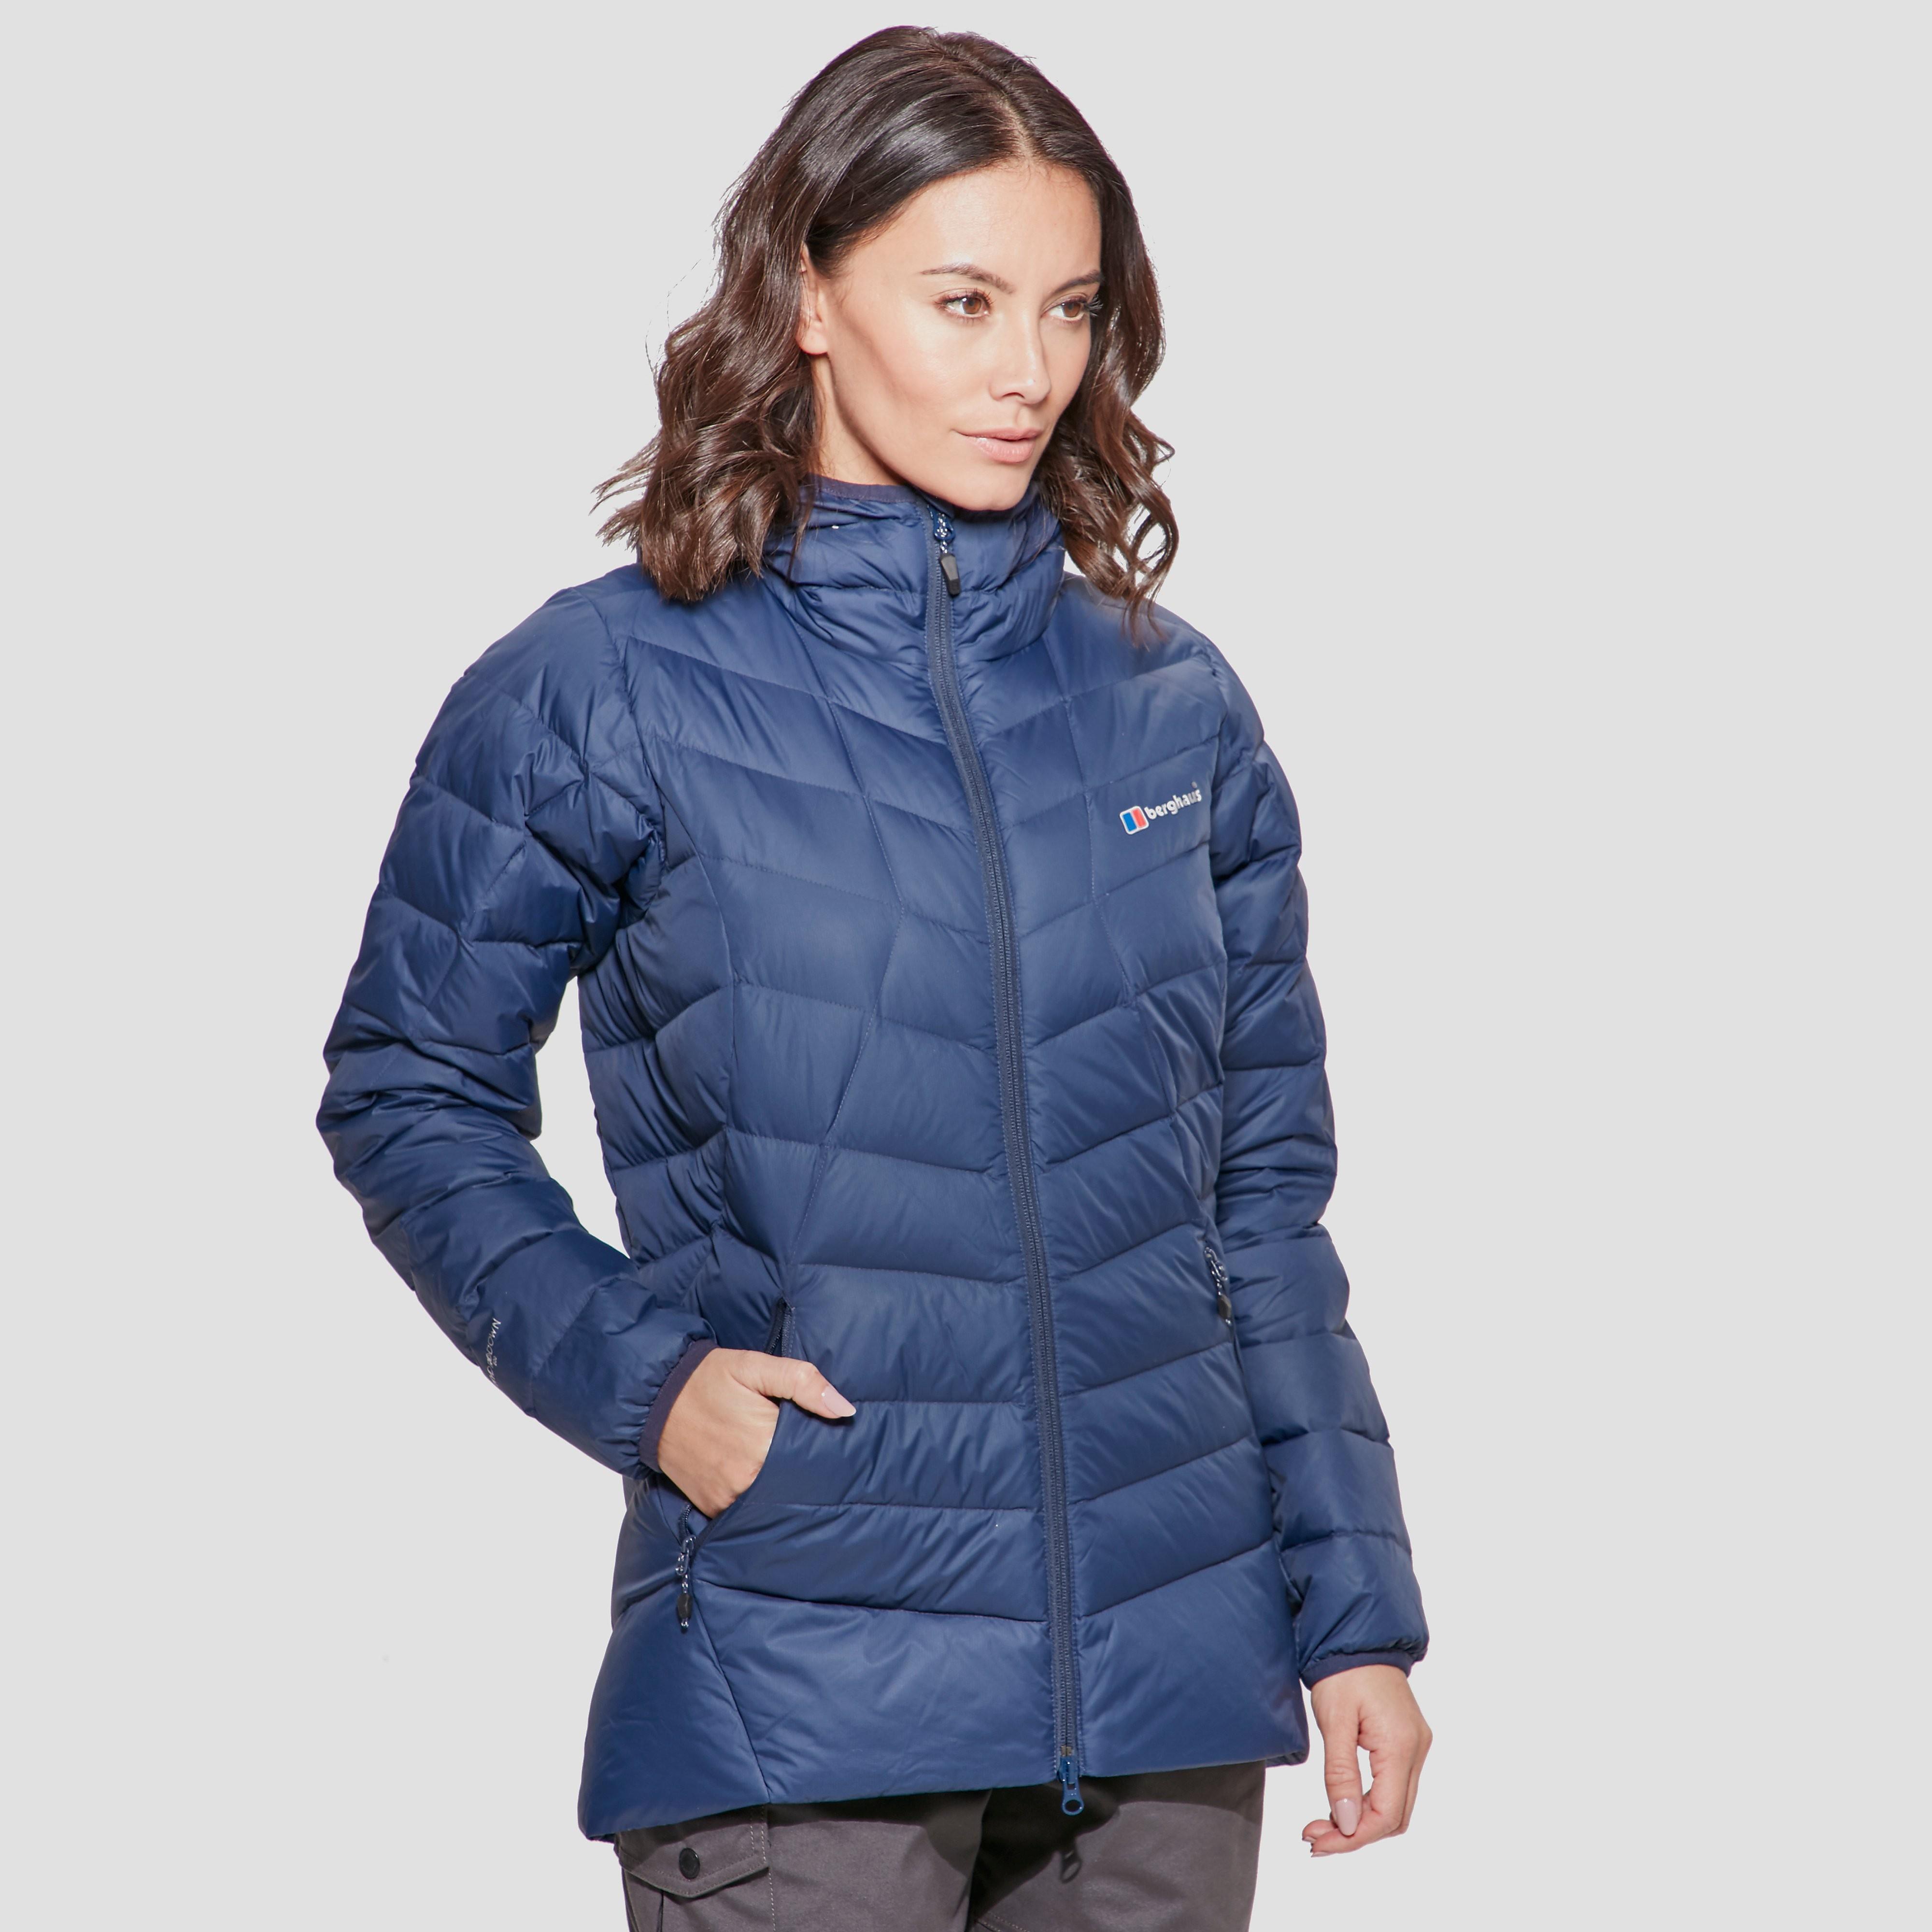 Berghaus Pele Women's Jacket